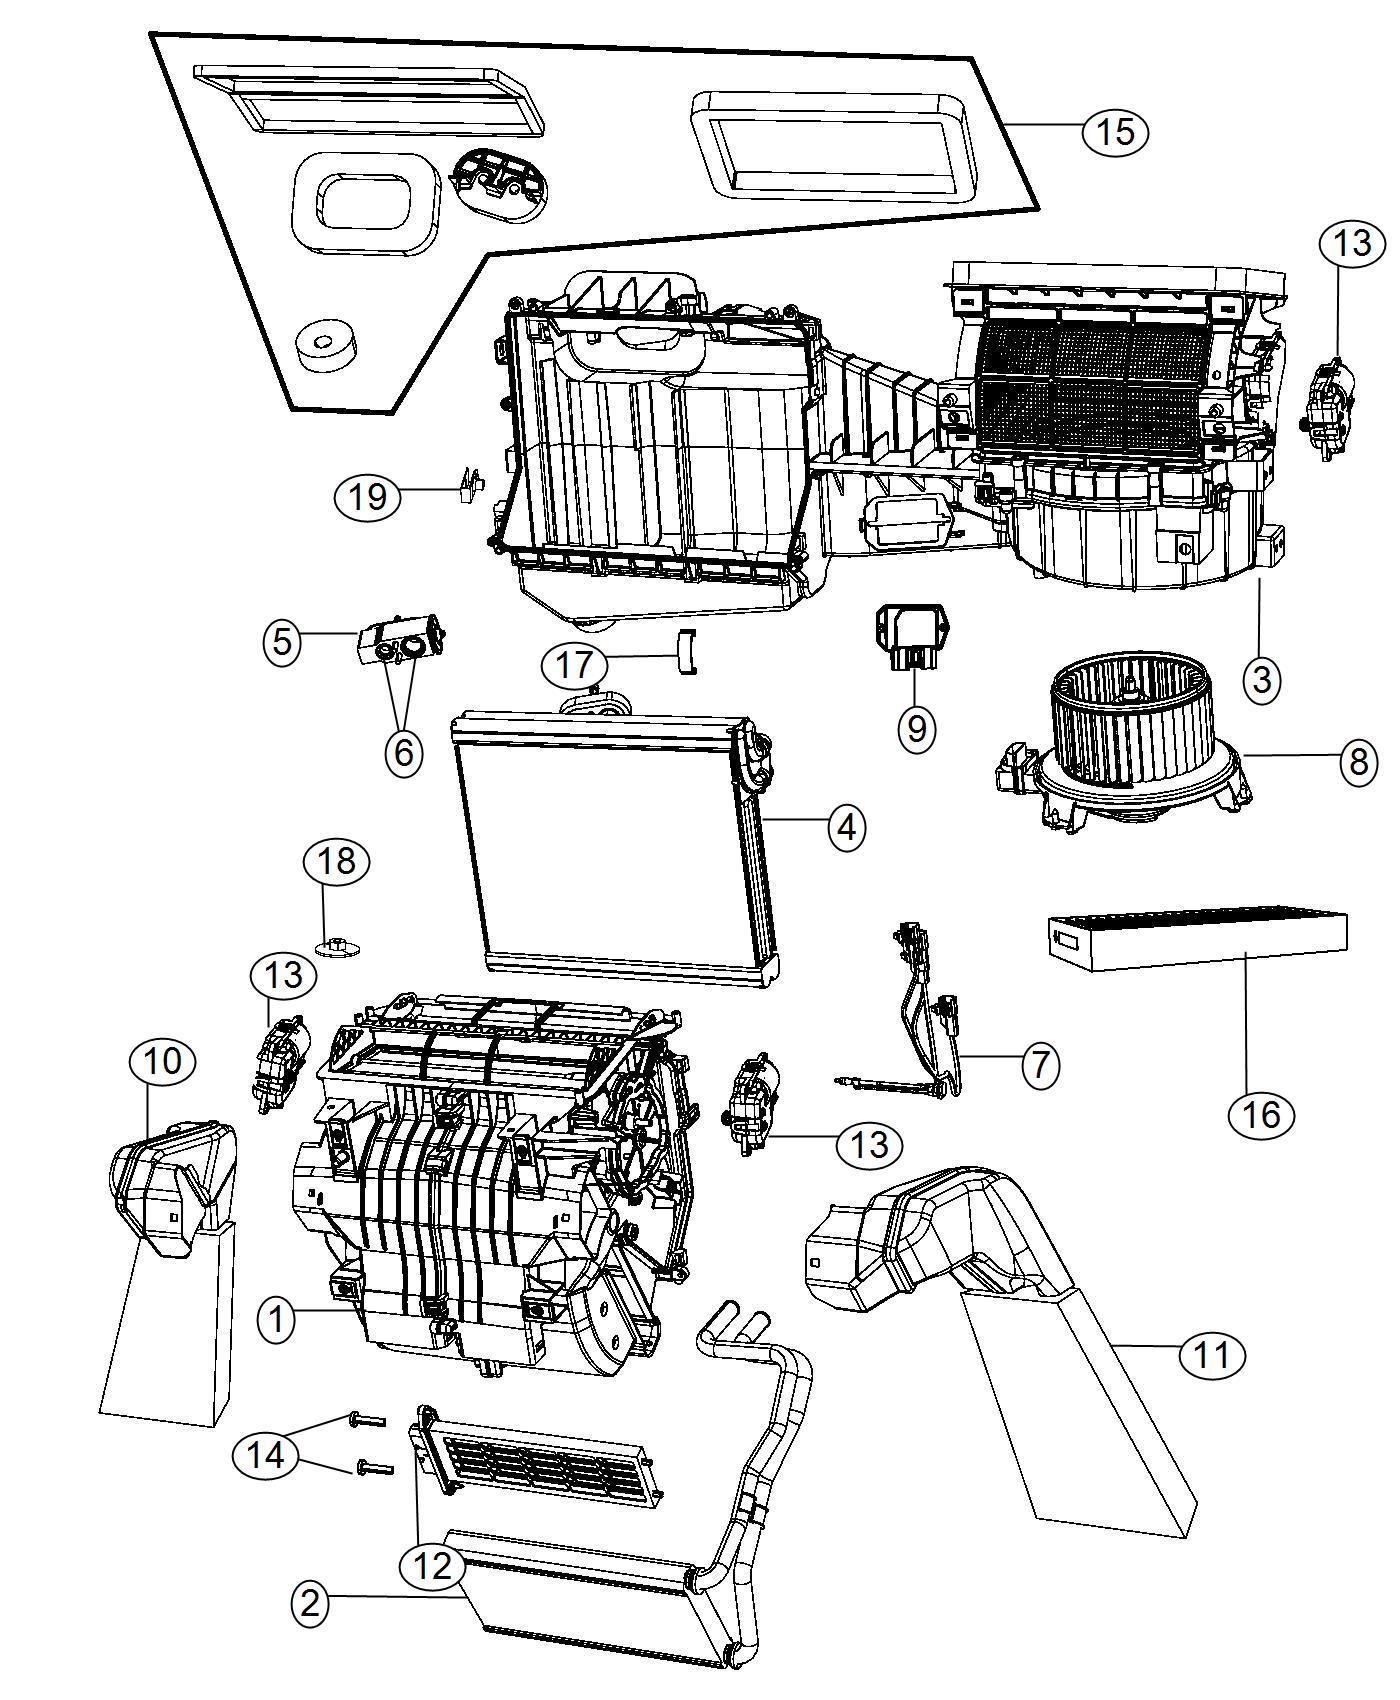 Jeep Wrangler Core Heater Export Mexico